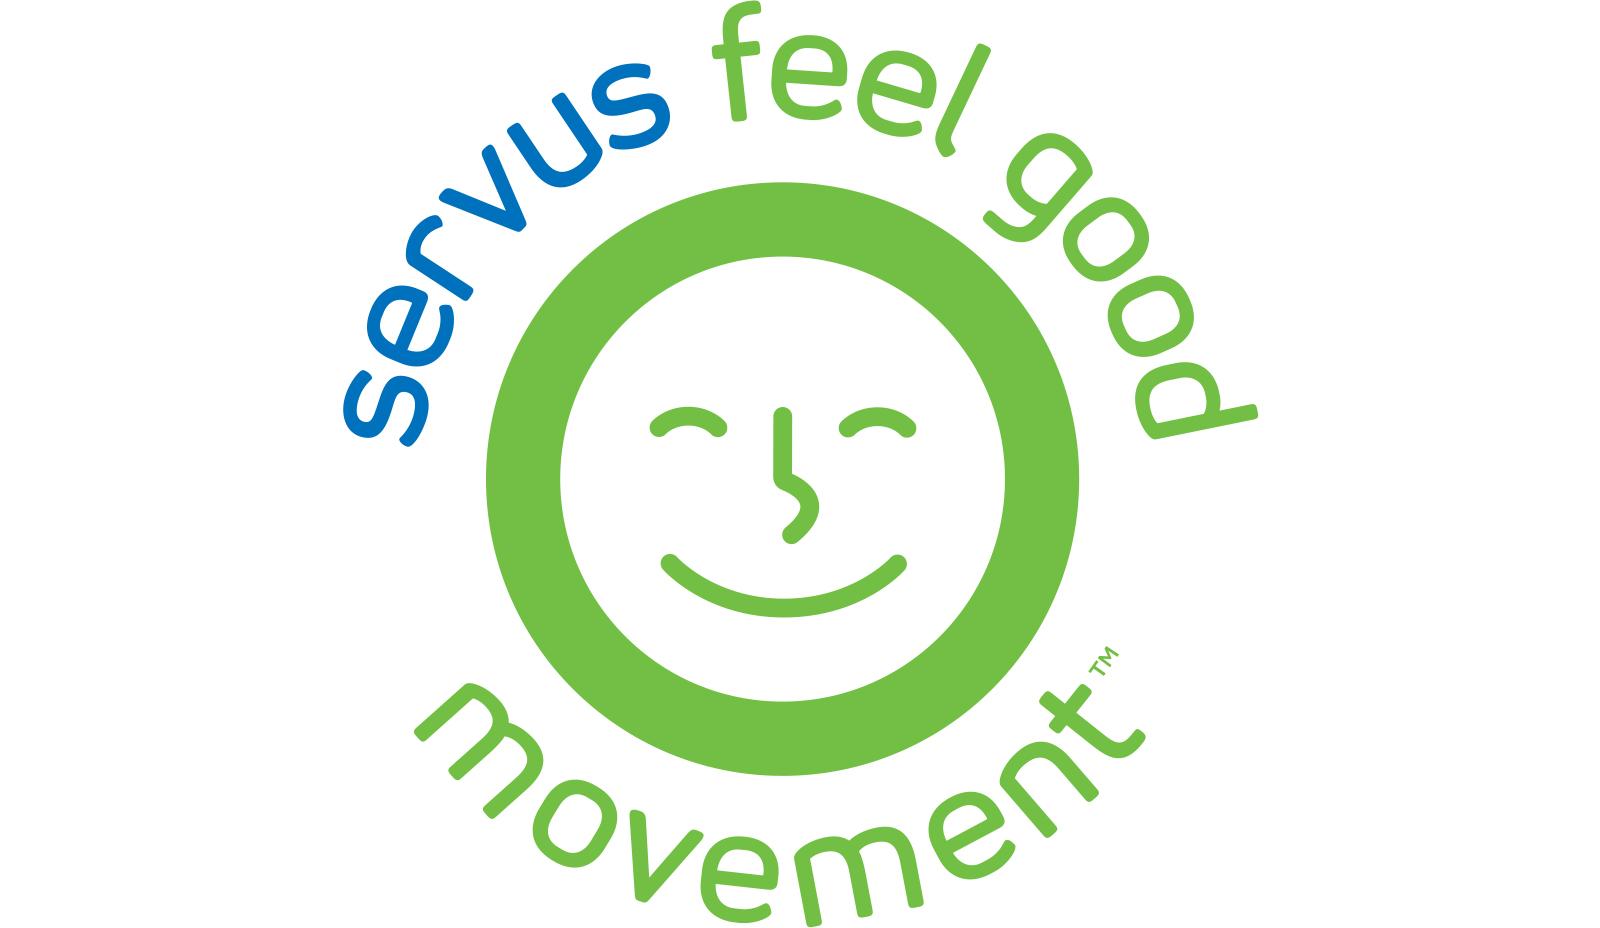 Servus Feel Good logo